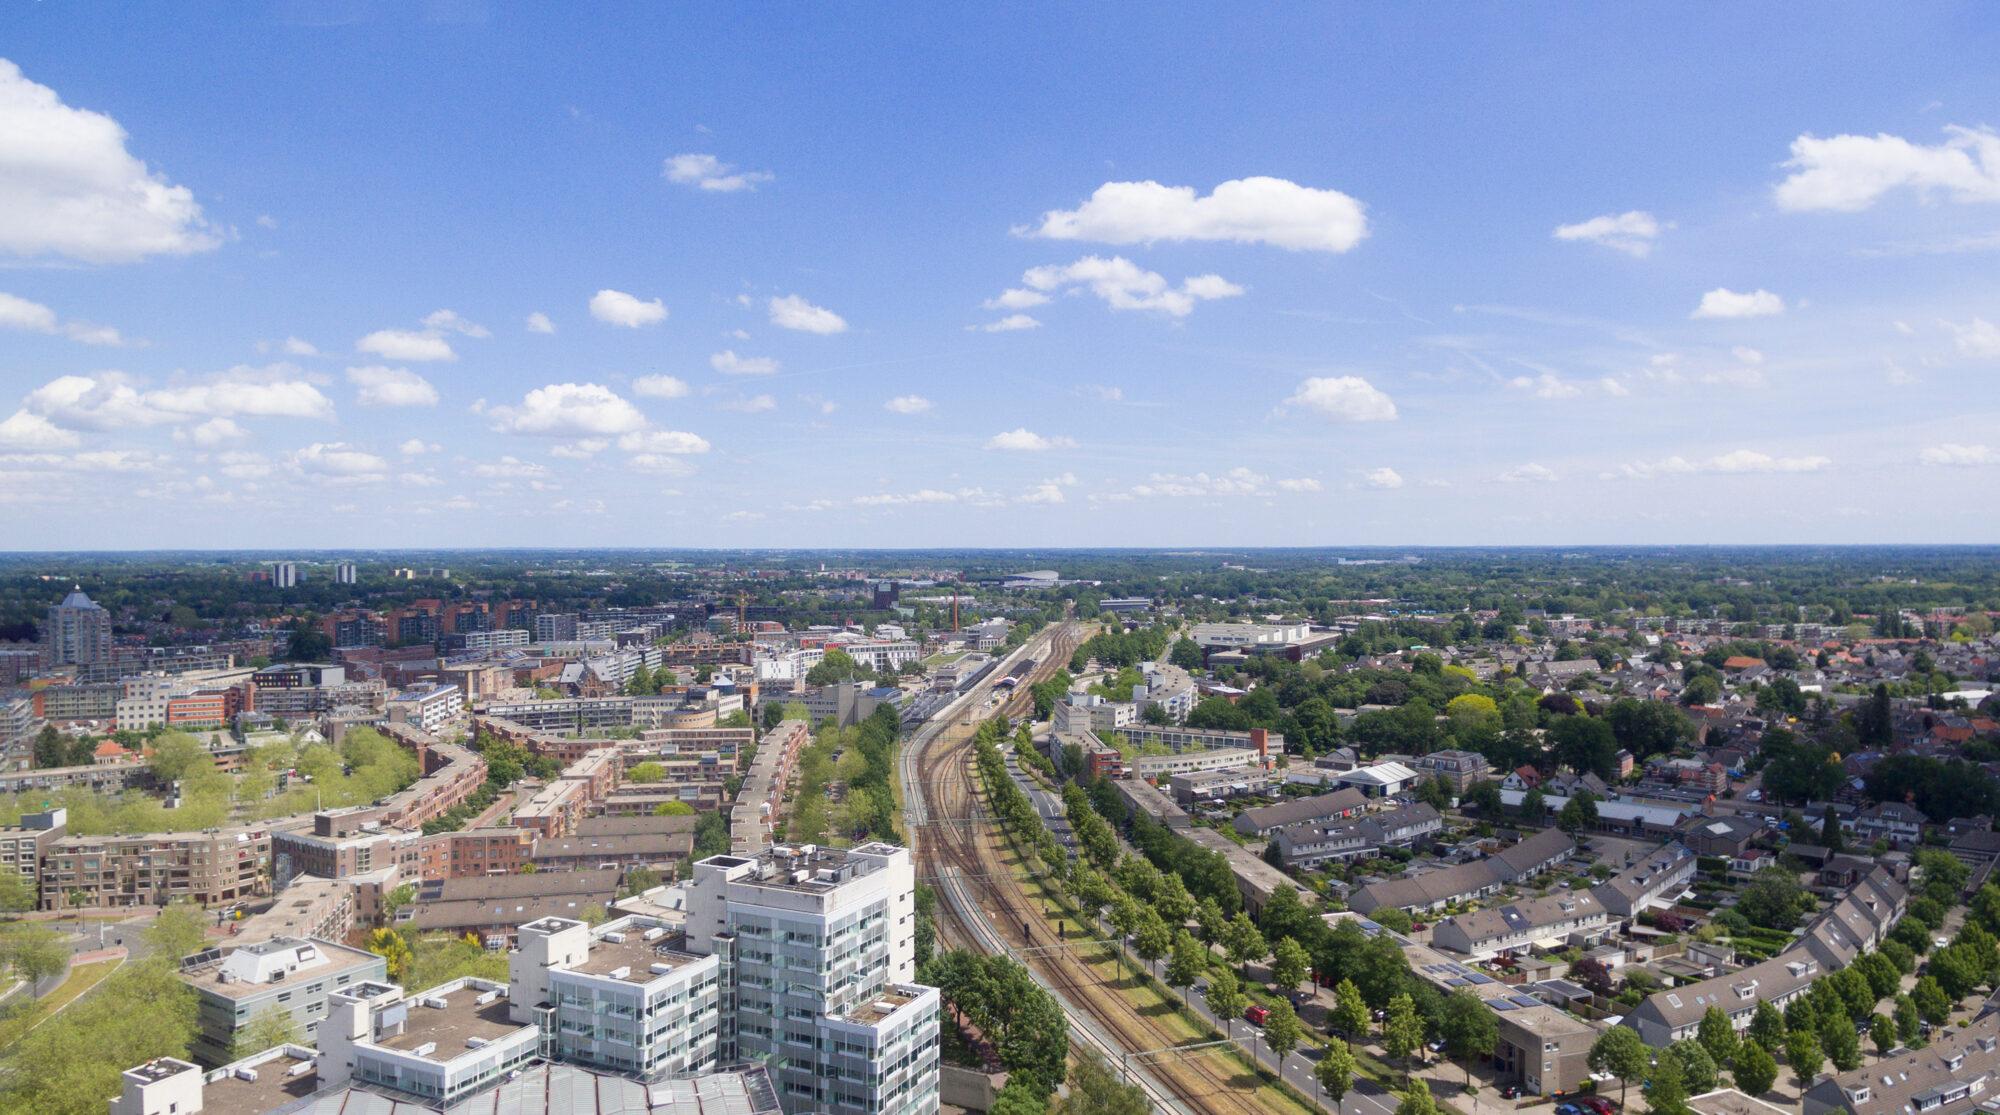 Gemeenteraad Apeldoorn: 'Beste Apeldoorners'